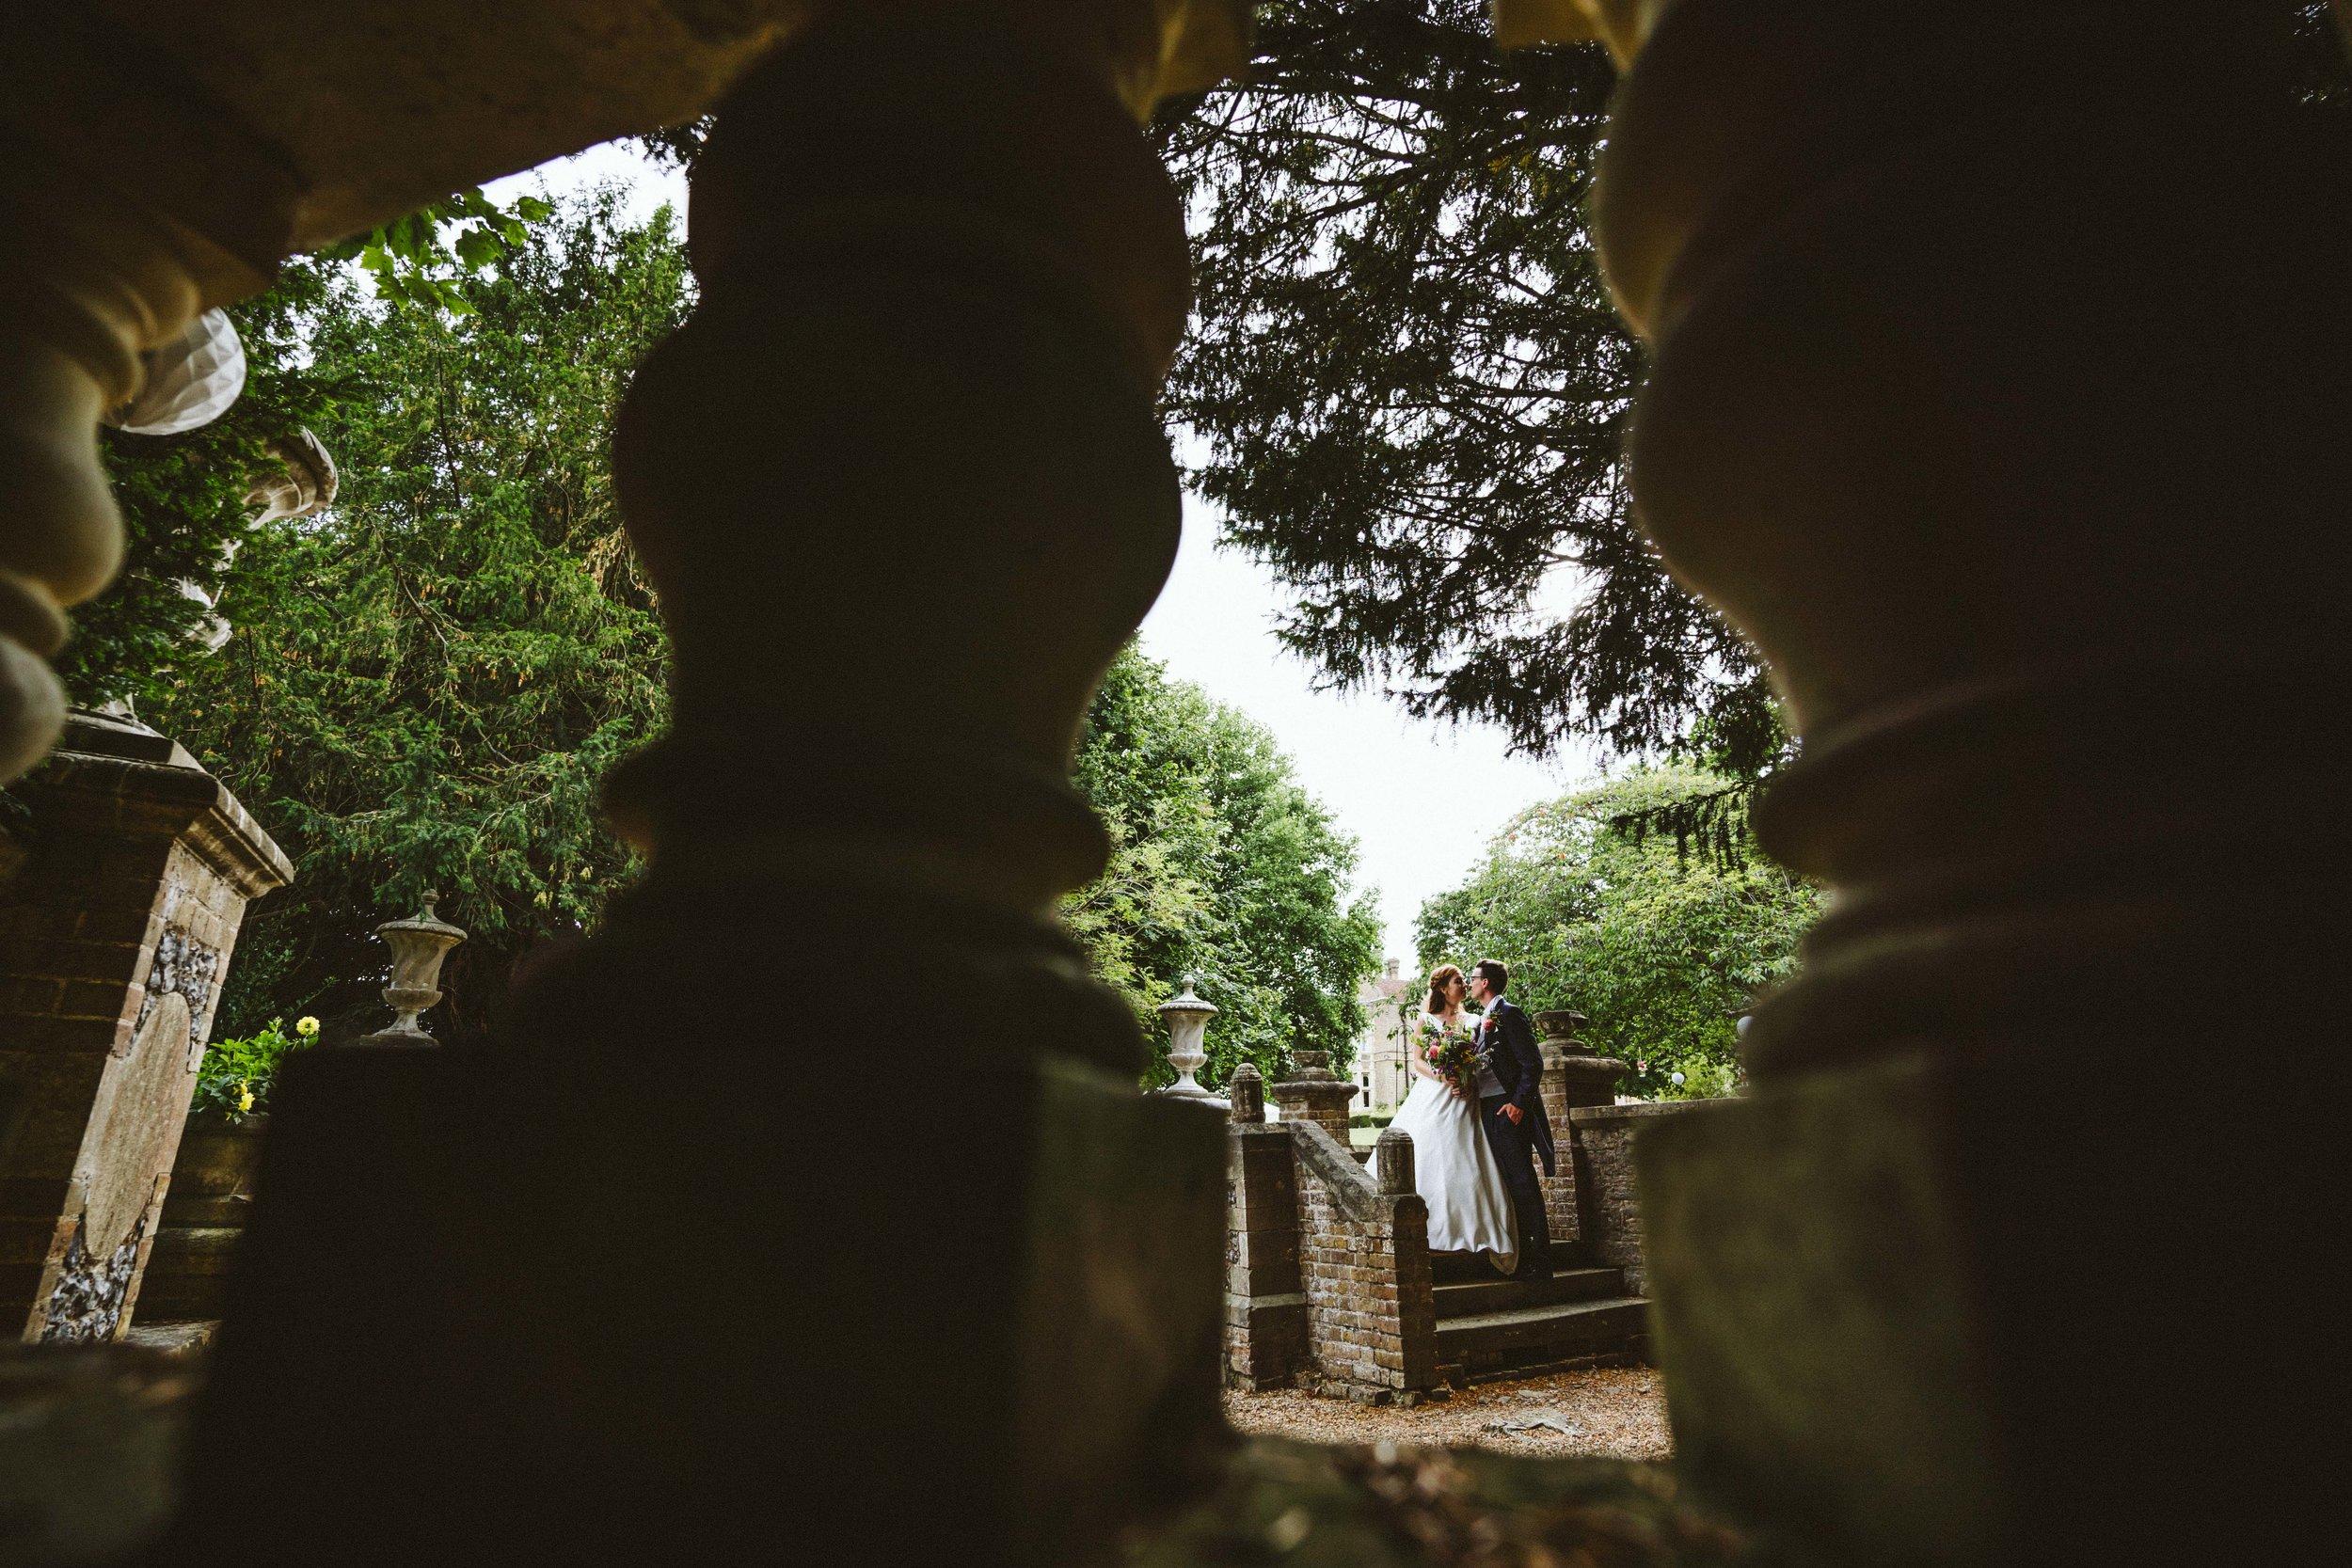 kent-wedding-photographer-109649.jpg